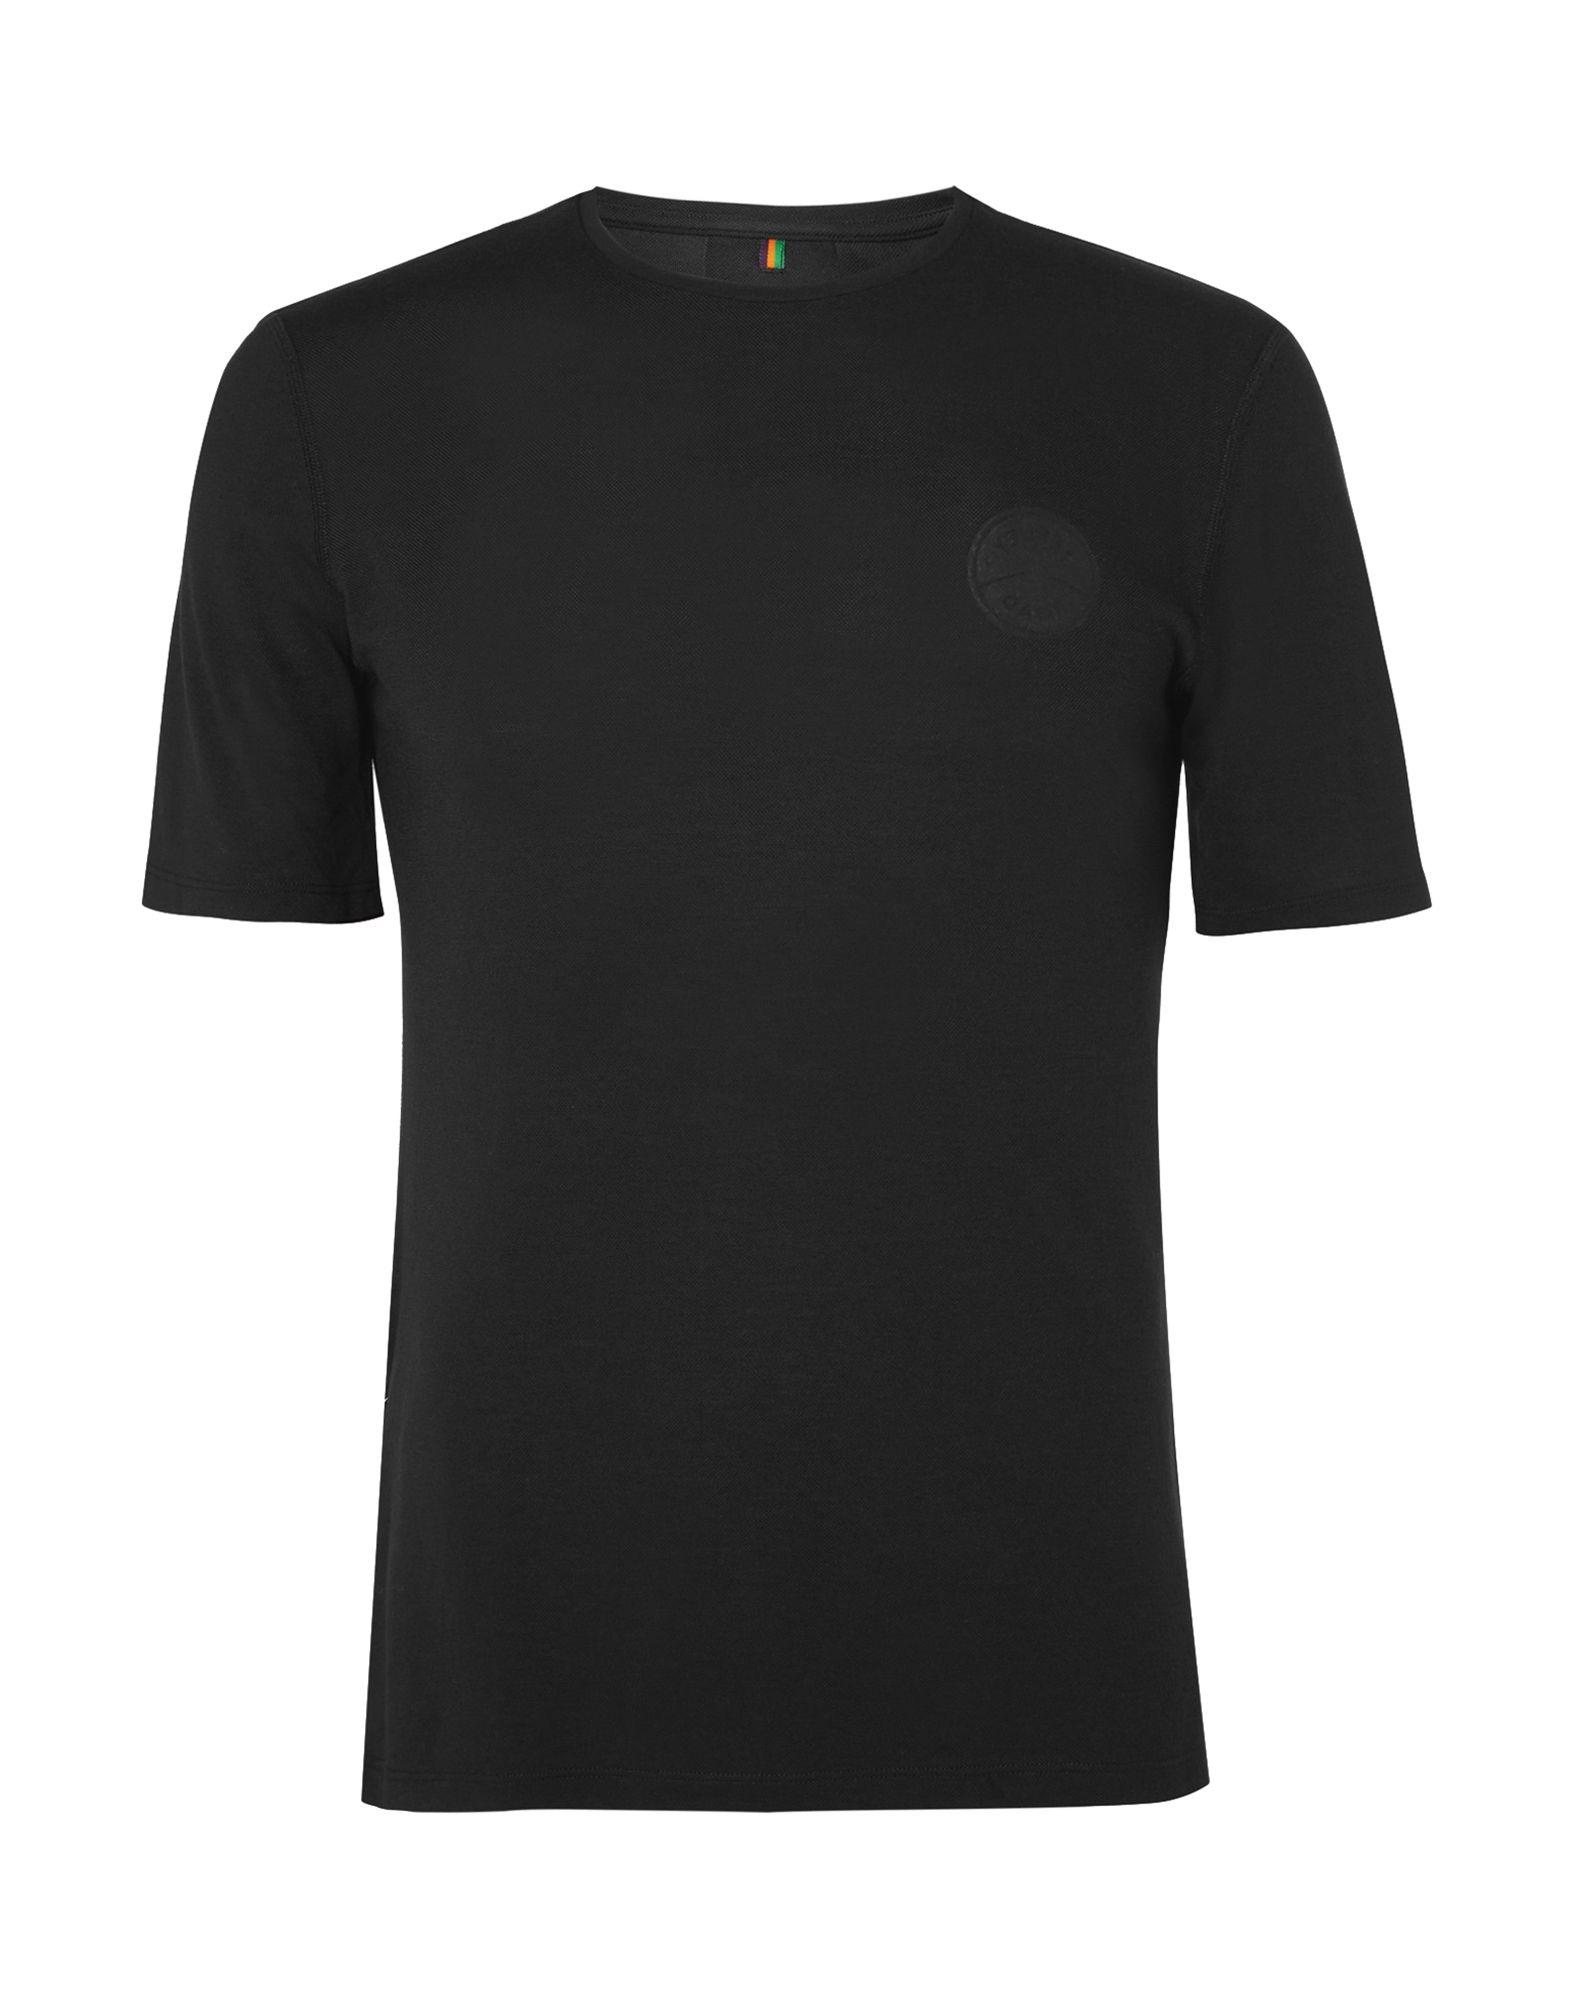 Iffley Road T-shirt In Black